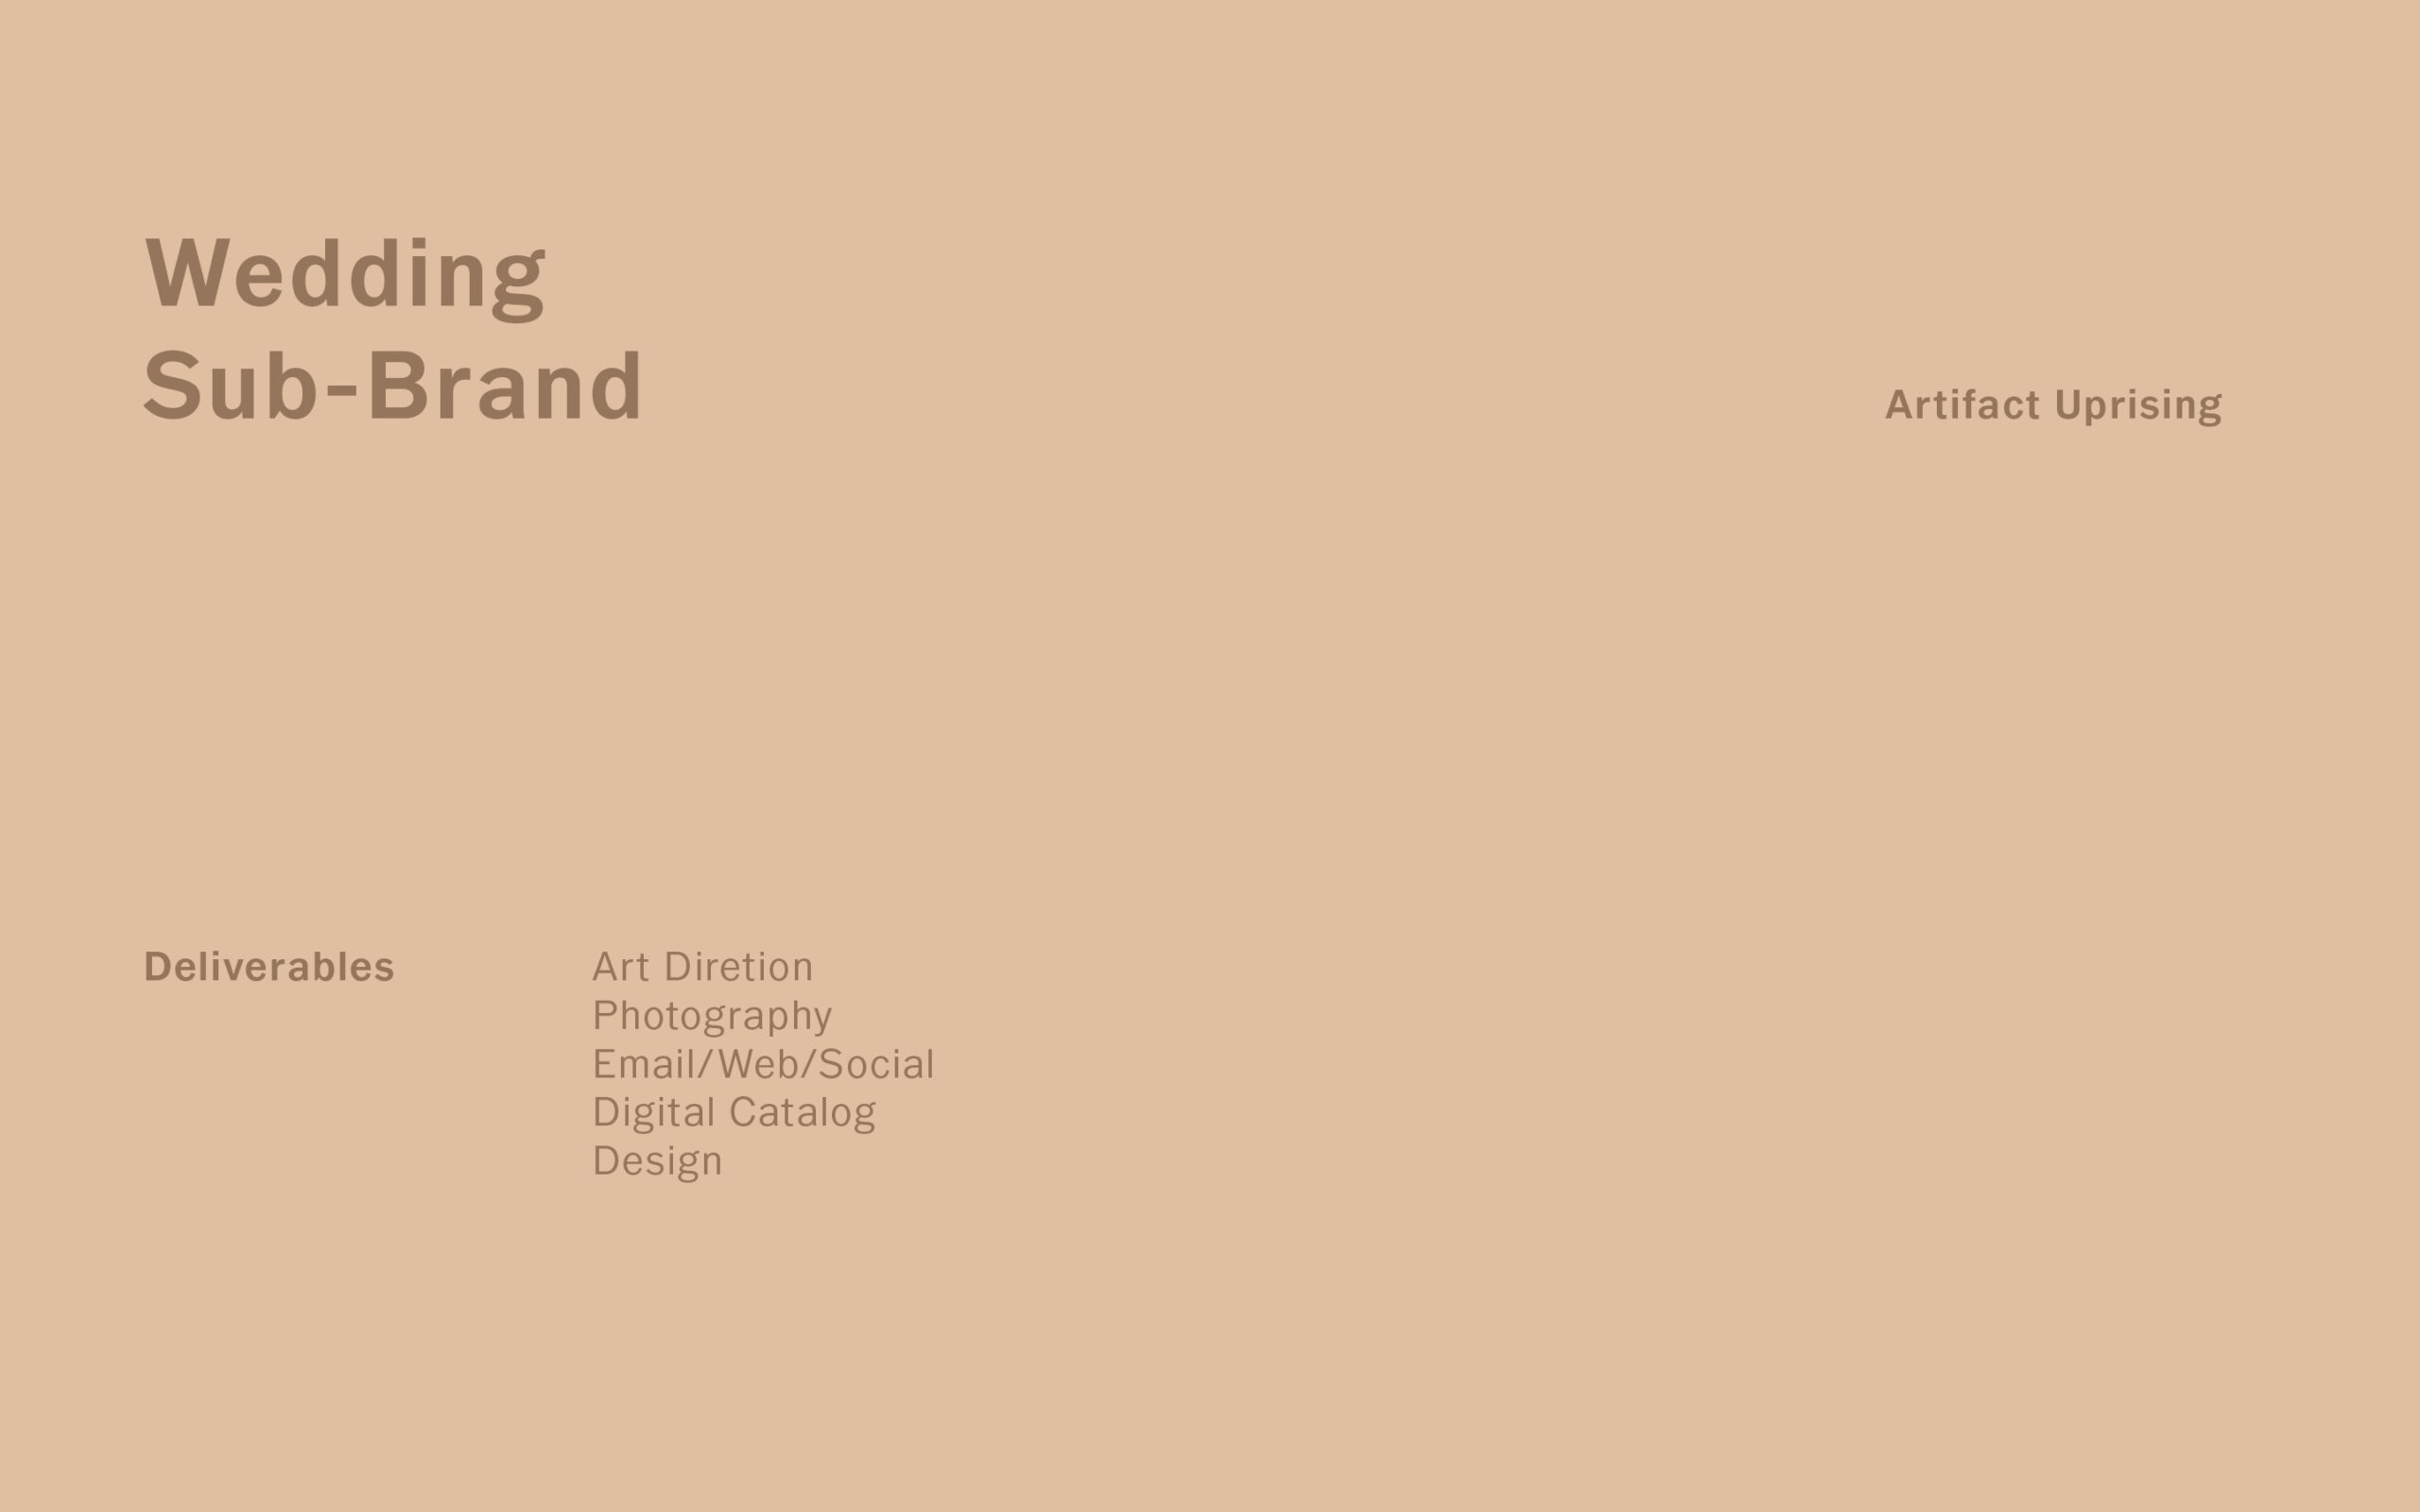 AU-Wed-01-Intro